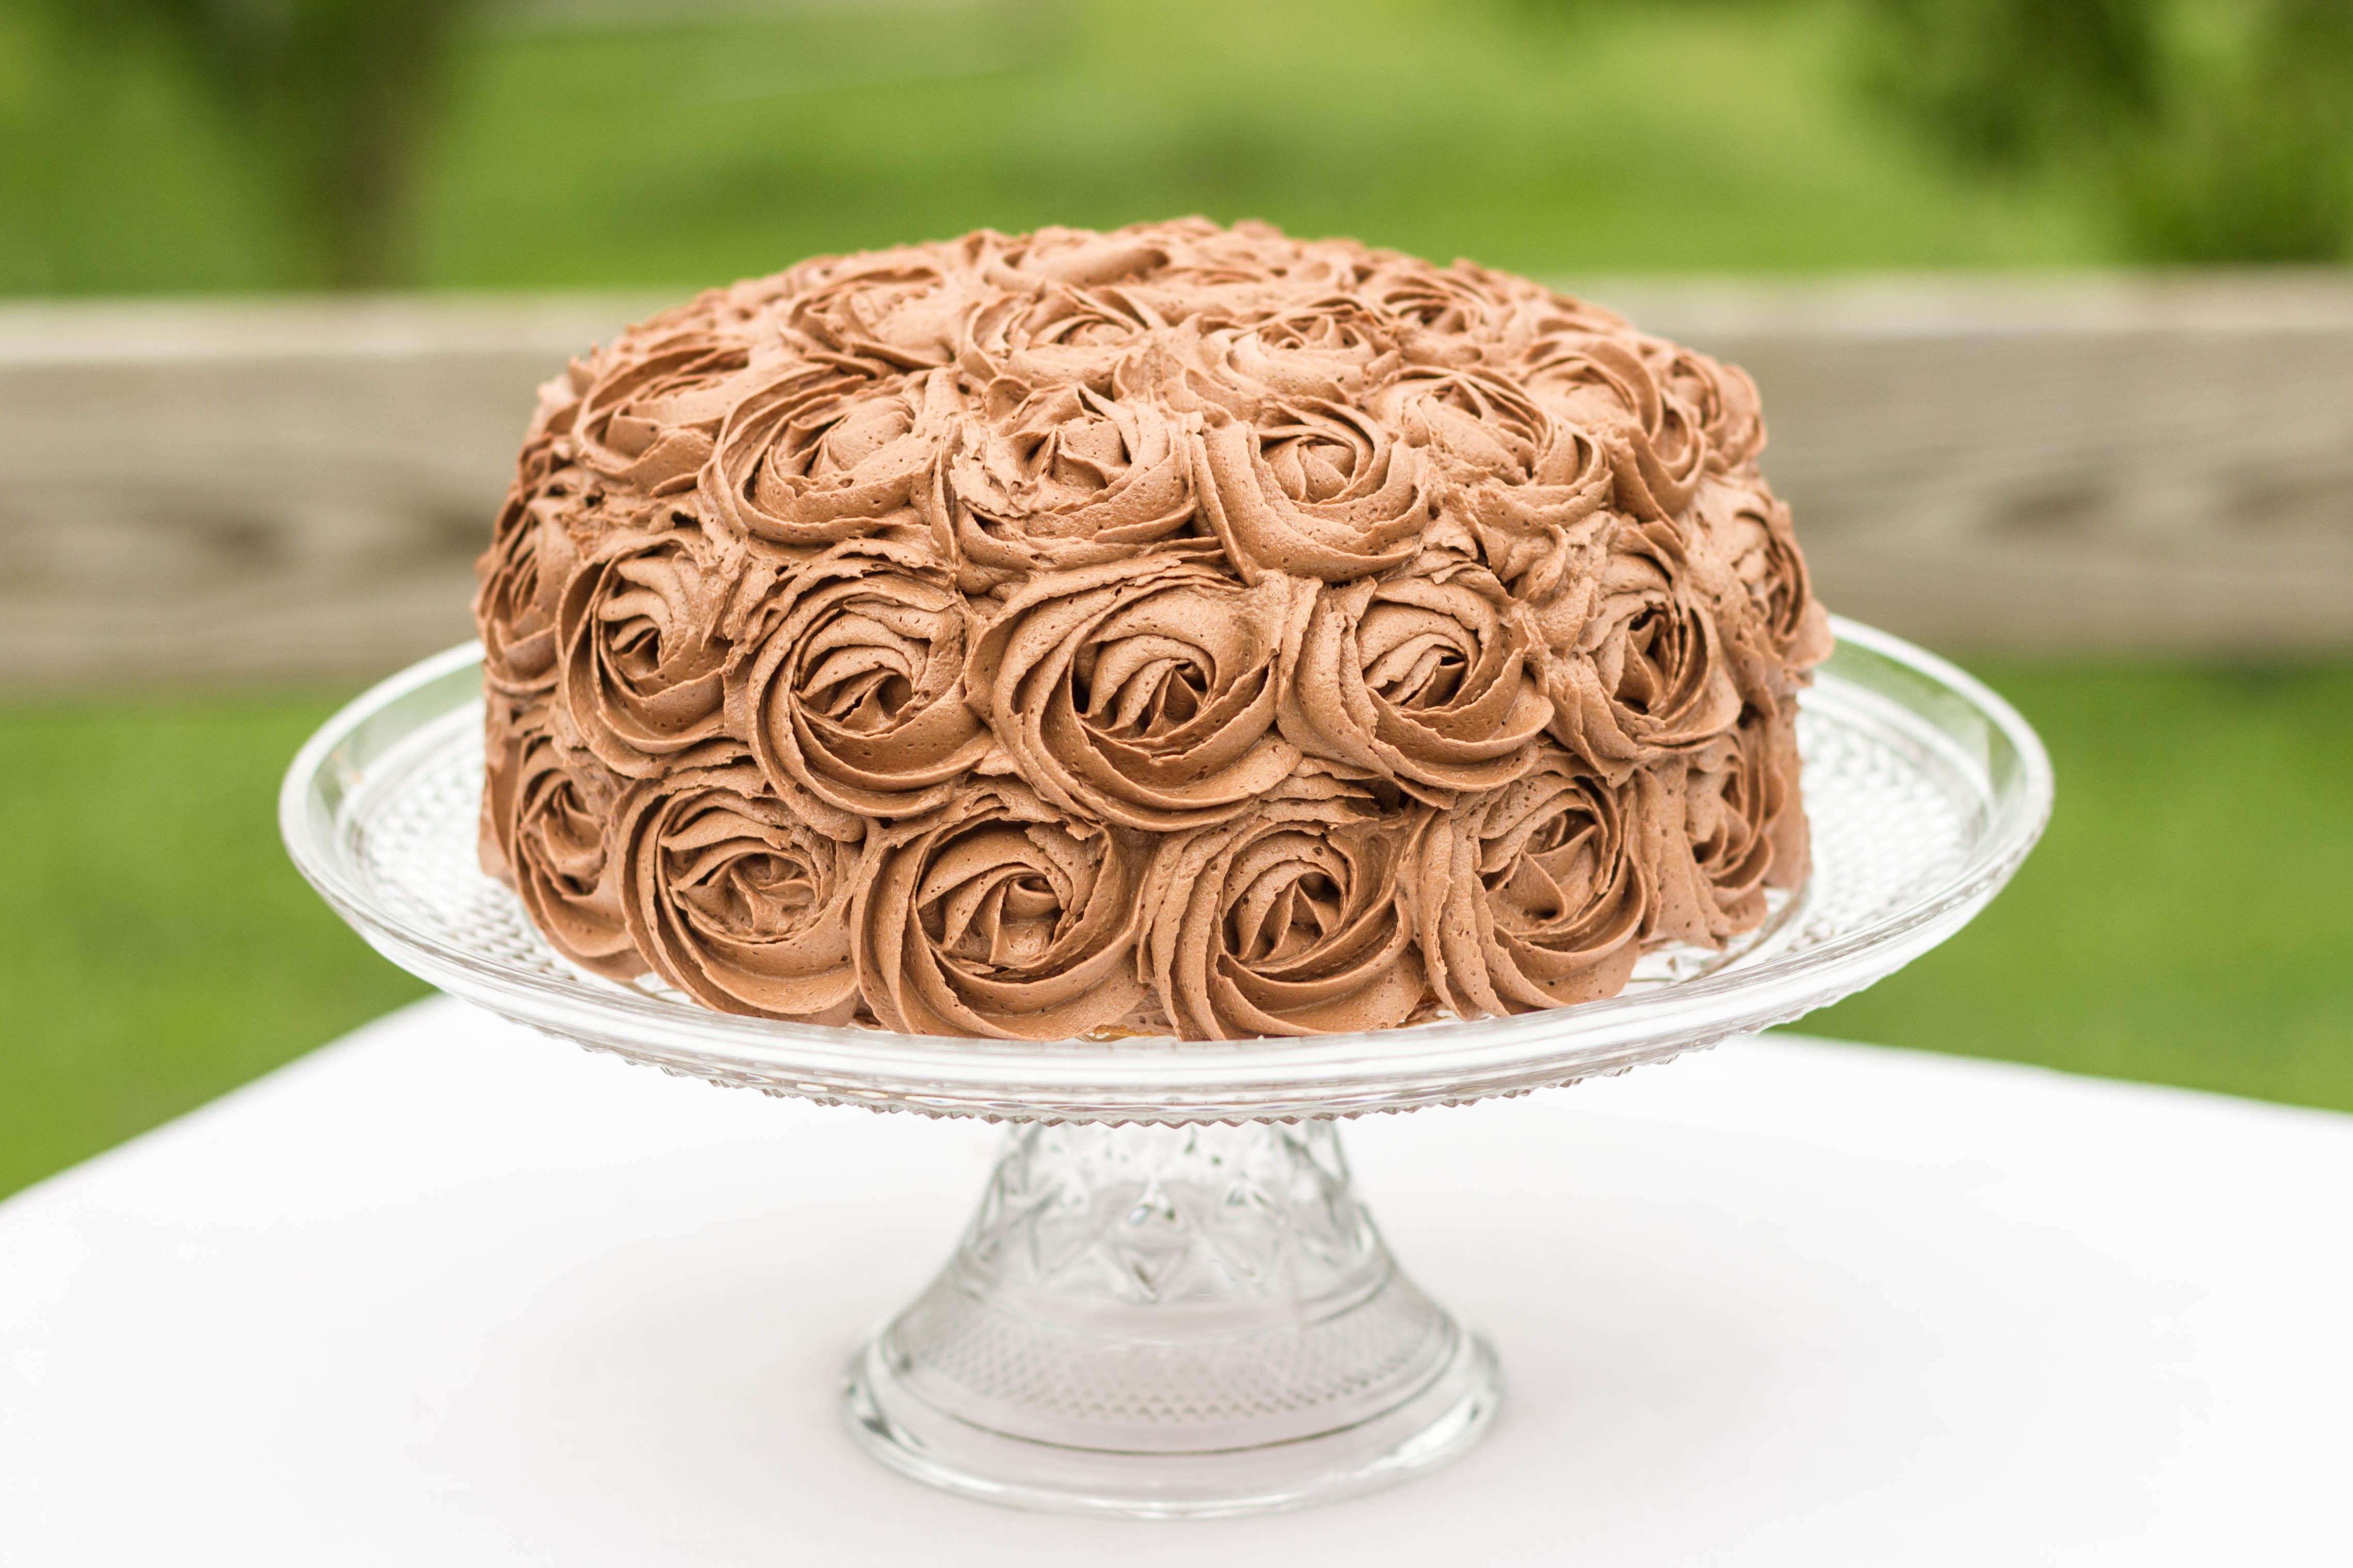 Chocolate Fudge Marble Rose Cake Kendra S Treats